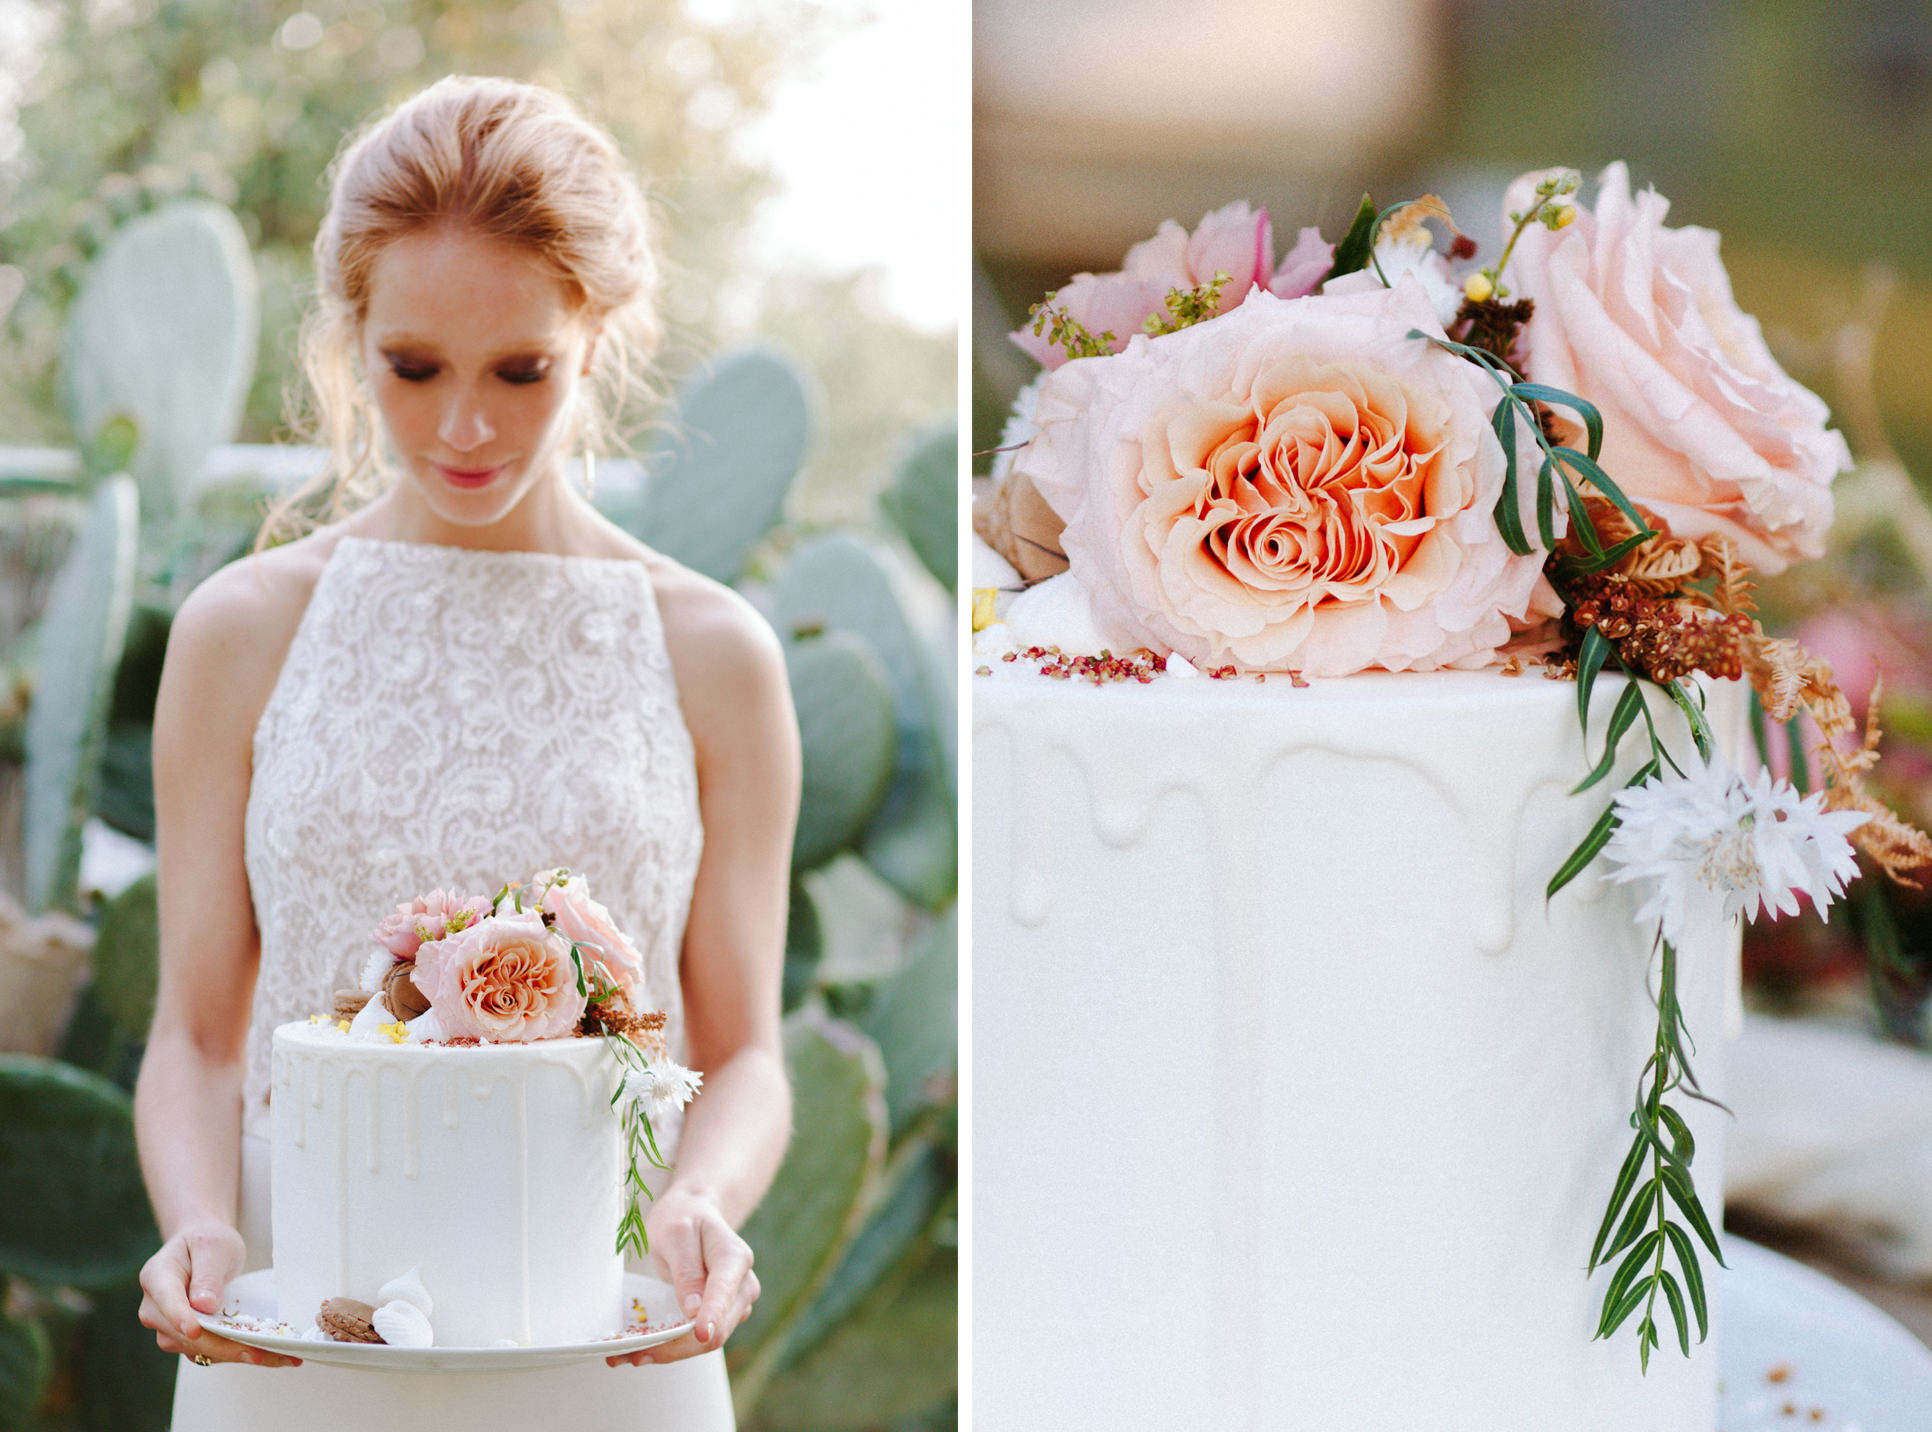 Romantic elopement in Apulia | Apulia elopement | Apulia wedding Masseria Alchimia - Fasano  Photos: Camilla Anchisi Photography  Planning: Camilla Cascino Weddings | Cake: Nana & Nana Cakes